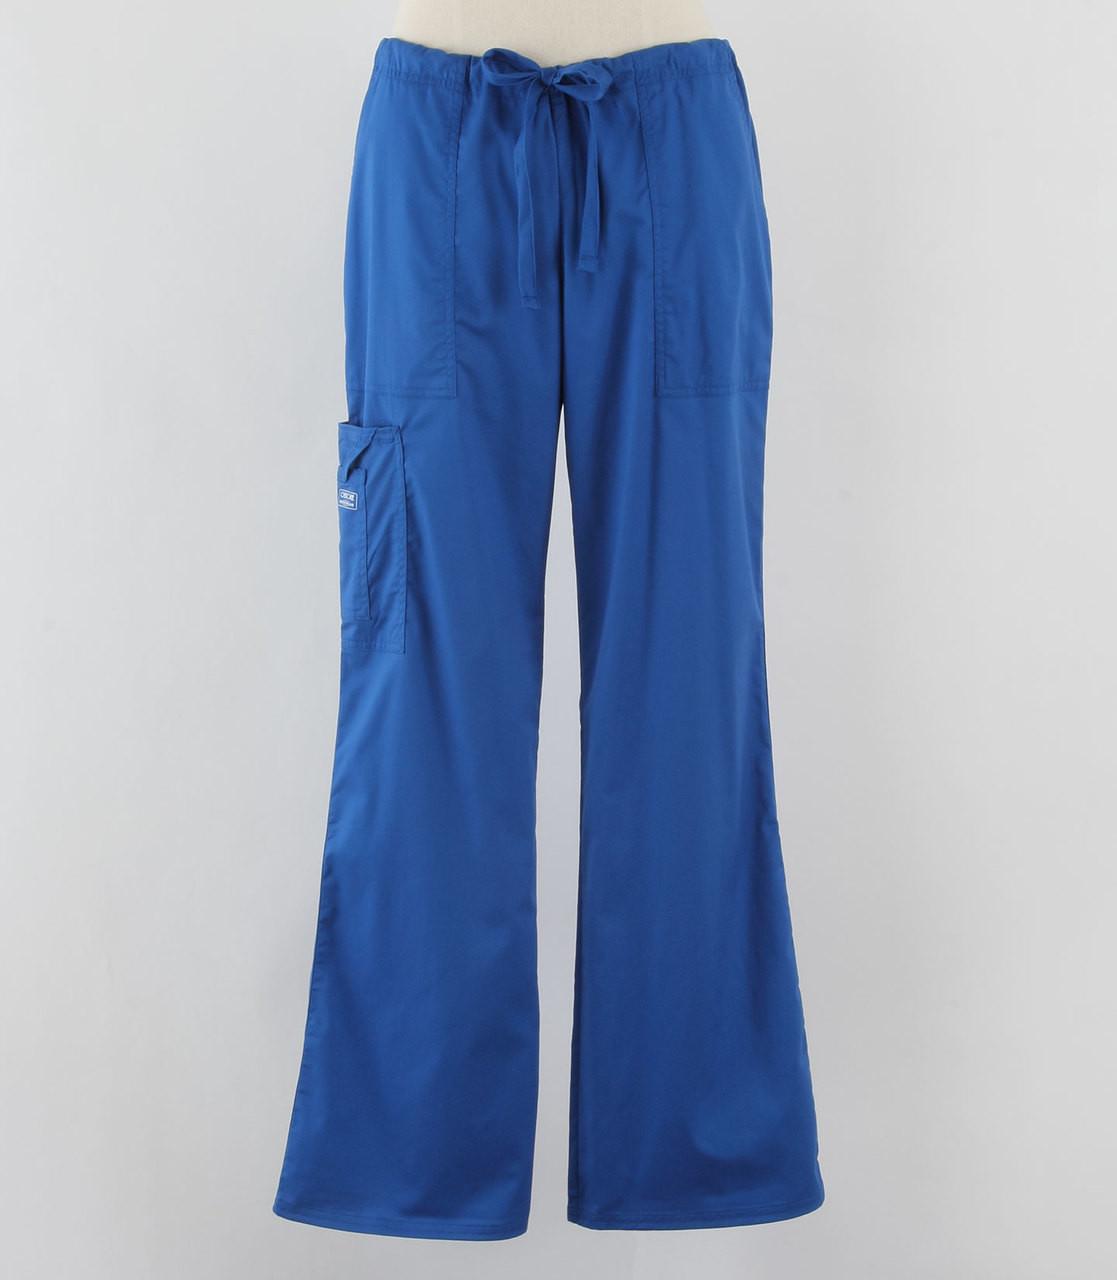 91894ece449 Cherokee Workwear Core Stretch Womens Cargo Scrub Pants Royal - Tall ...